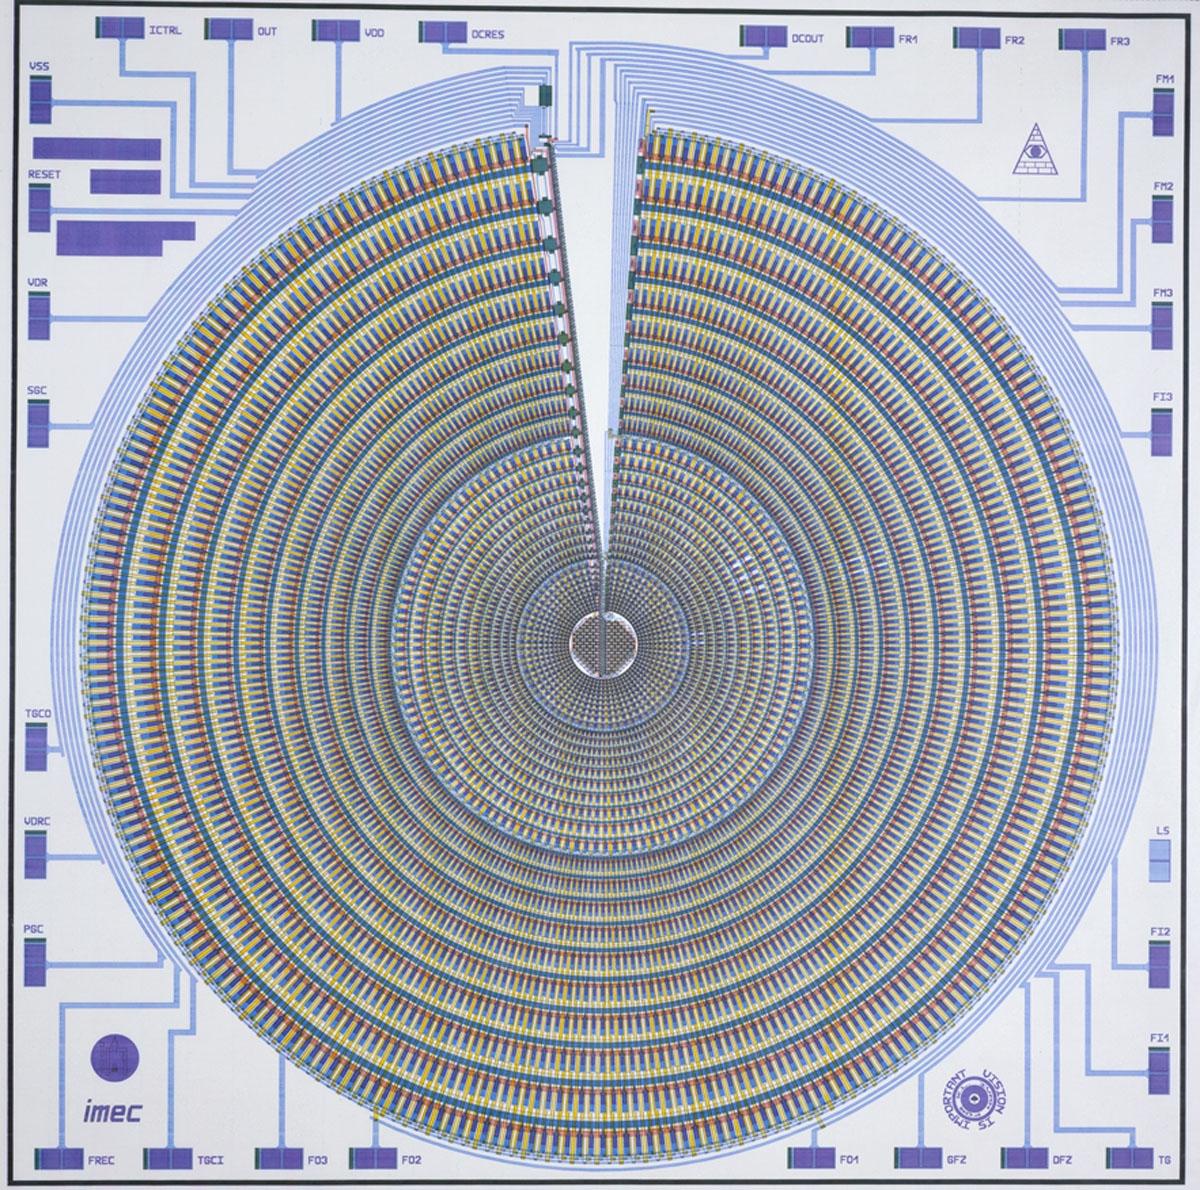 medium resolution of sony ccd wiring diagram wiring diagram blogs sony mex n4100bt wiring diagram sony ccd wiring diagram